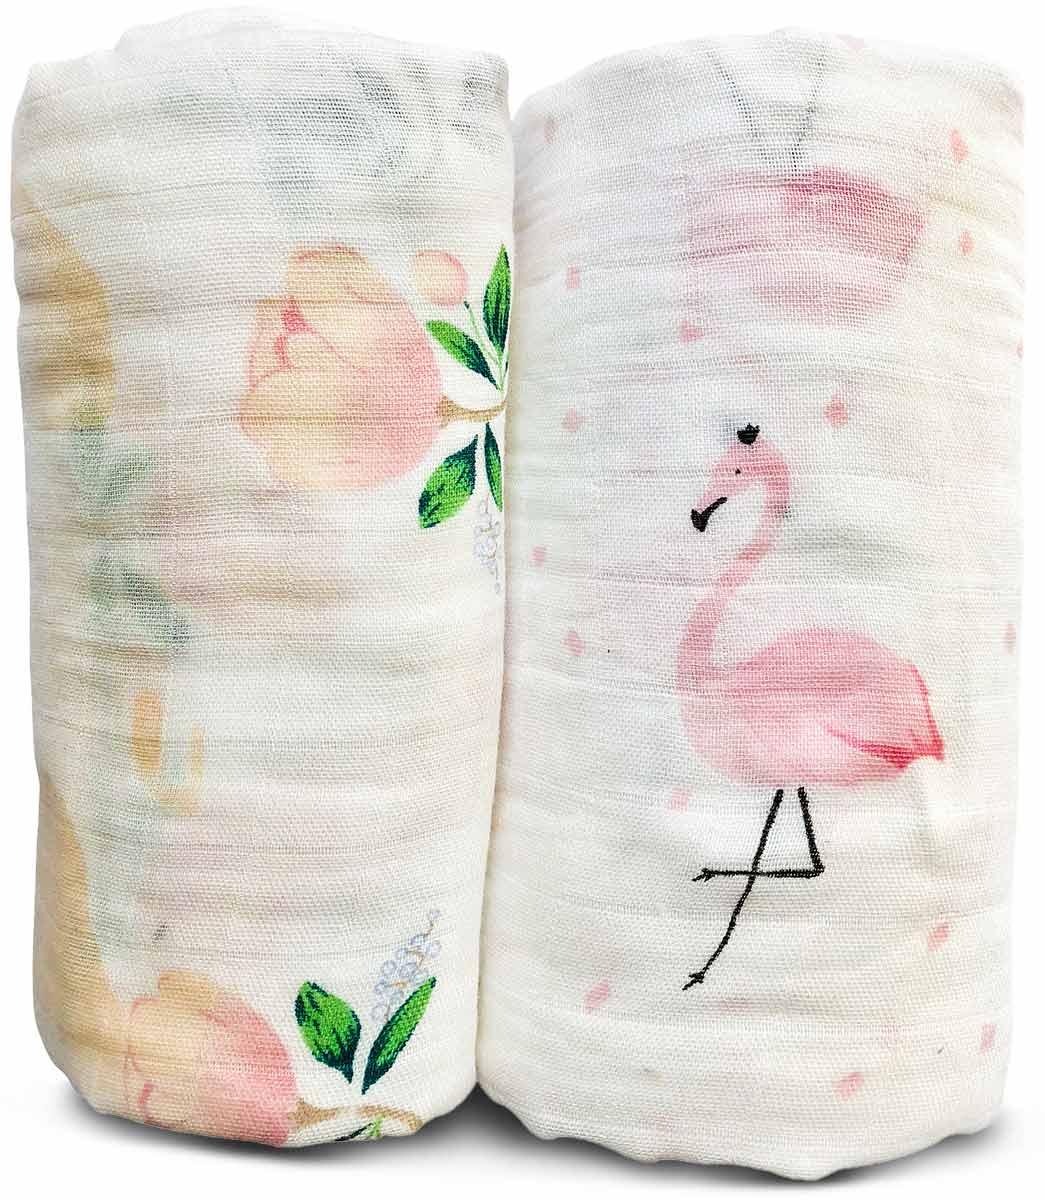 NEVO   זוג חיתולי טטרה במבוק גדולים במיוחד באריזת מתנה - עיצוב פלמינגו ופרחיםתמונה של